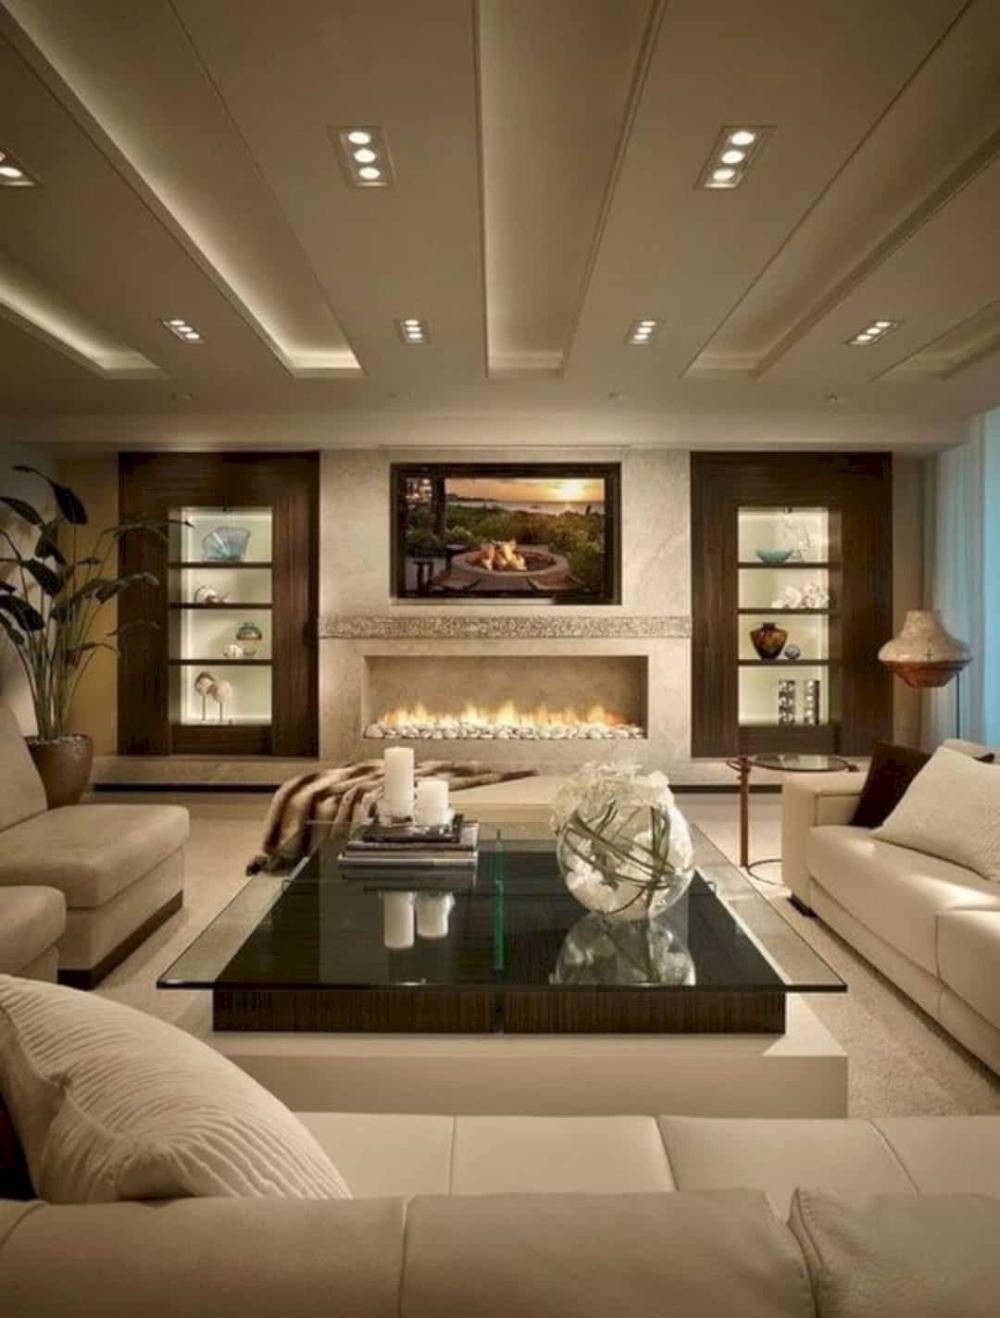 4 Modern Room Decoration Ideas Contemporary Decor Living Room Contemporary Living Room Design Living Room Decor Modern